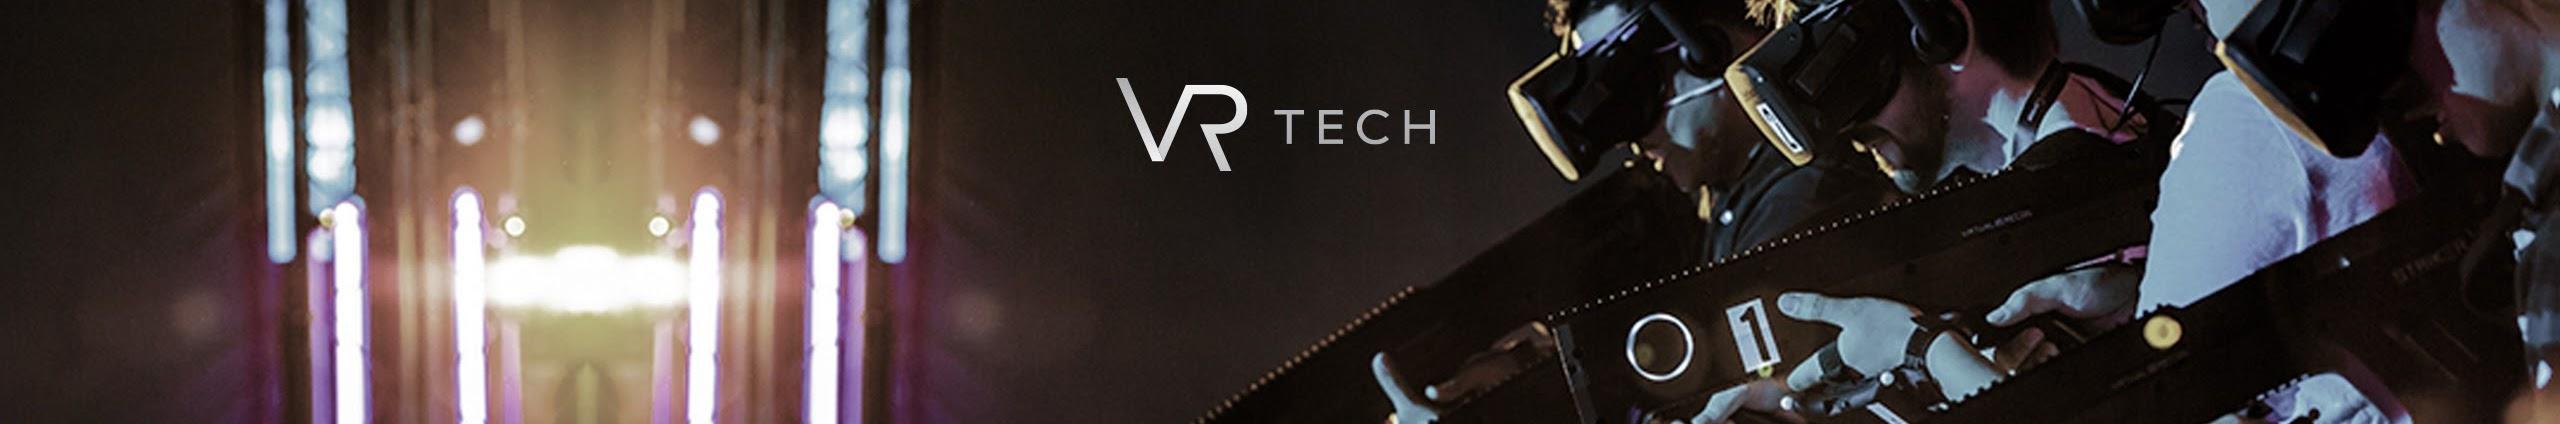 82332e22ffa VRTech Global - YouTube